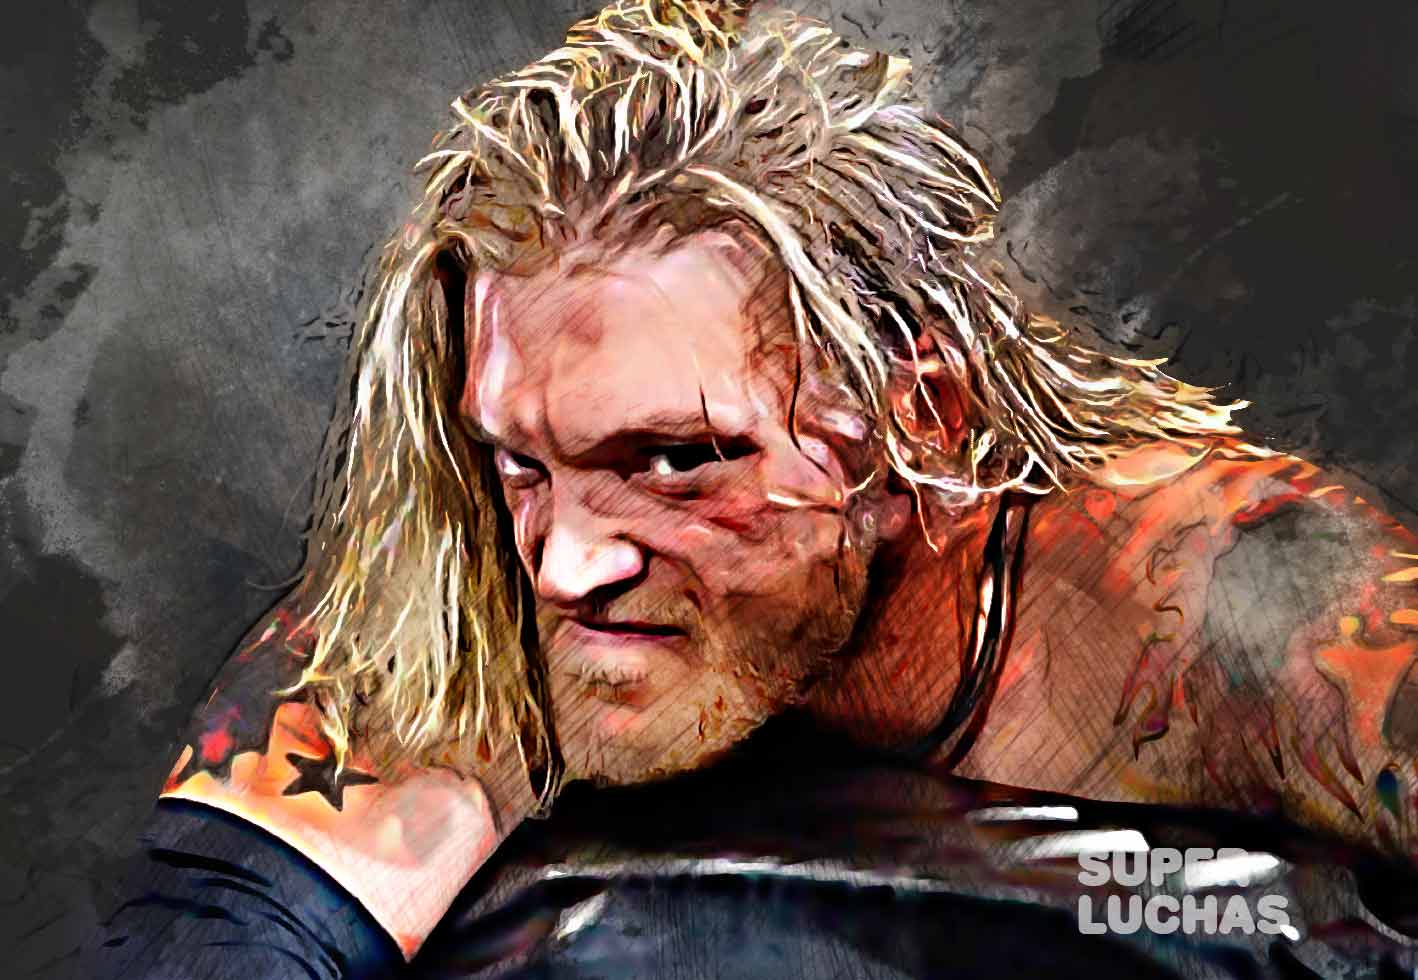 Tres oponentes que podría tener Edge si vuelve a WWE